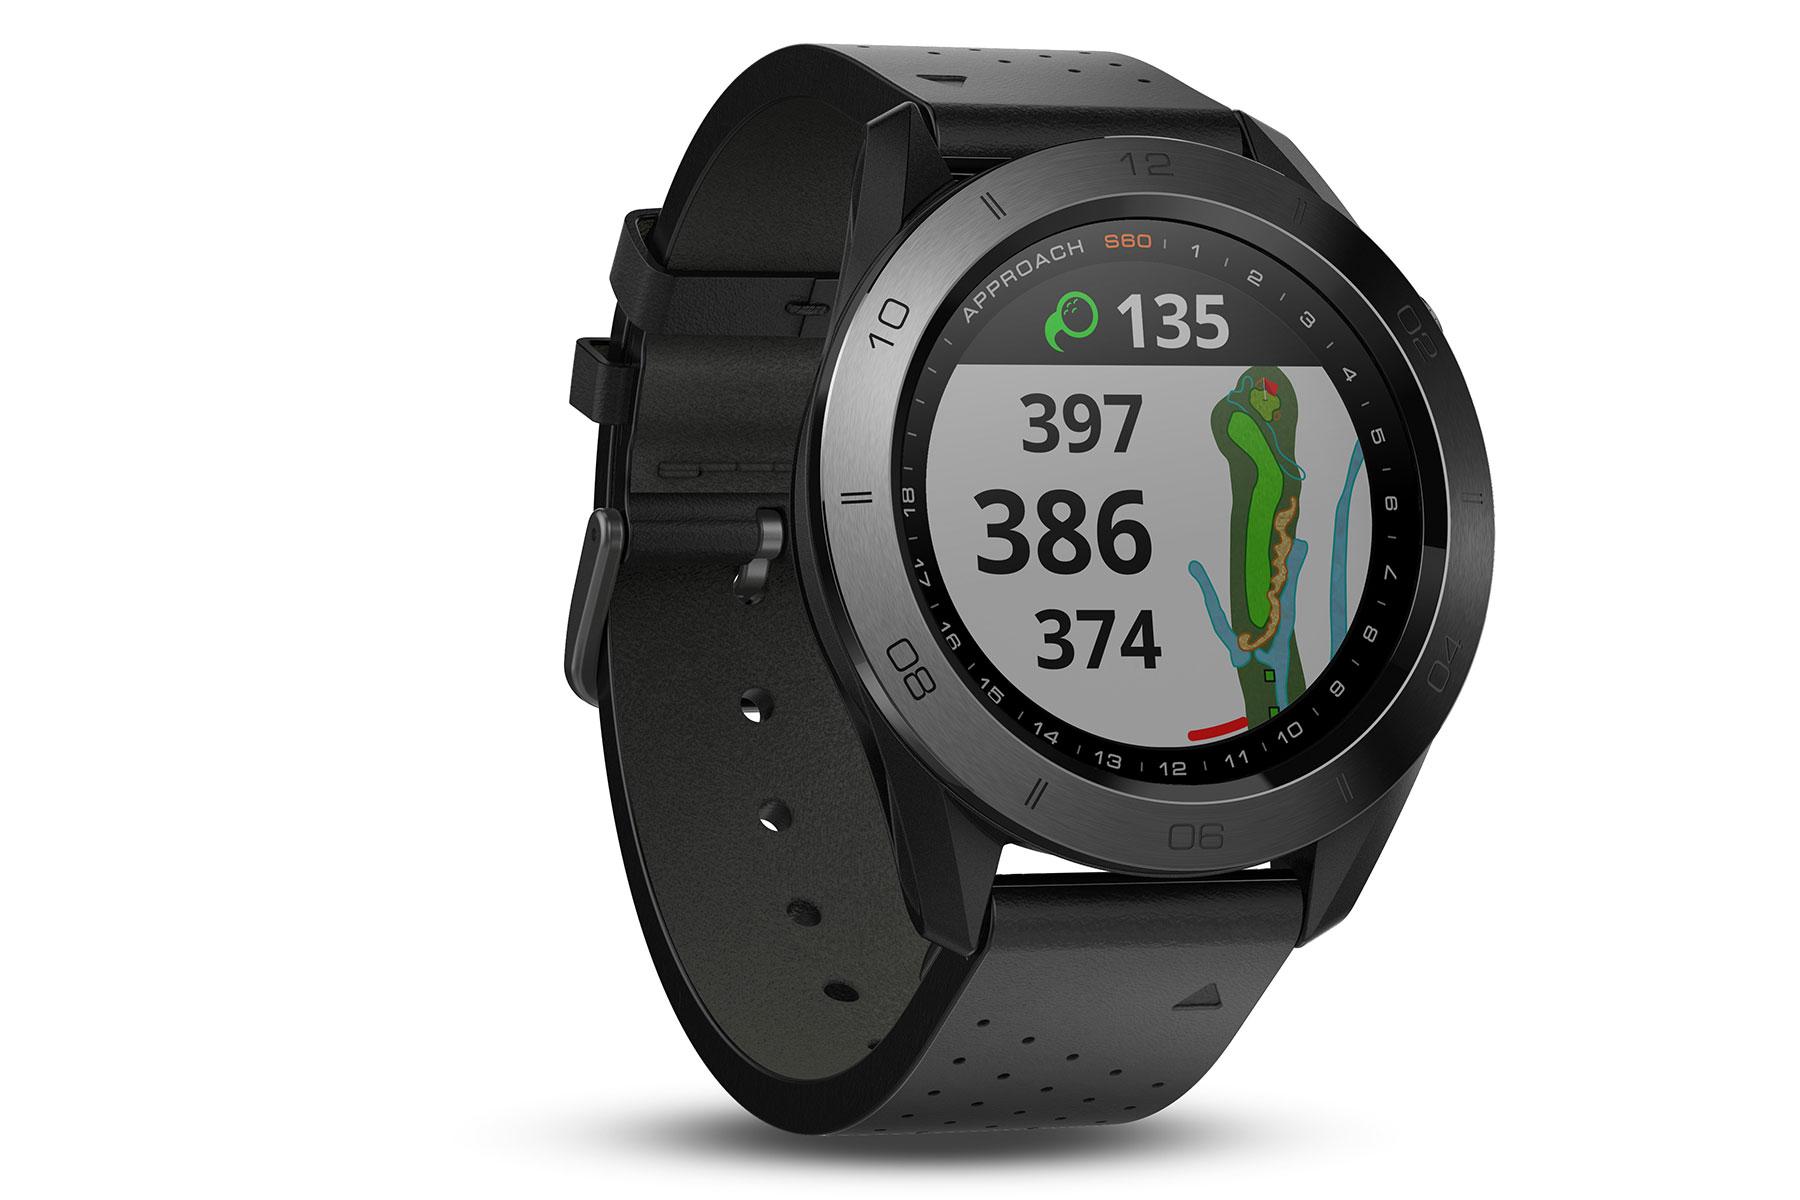 Garmin Approach S60 GPS Premium Watch from american golf